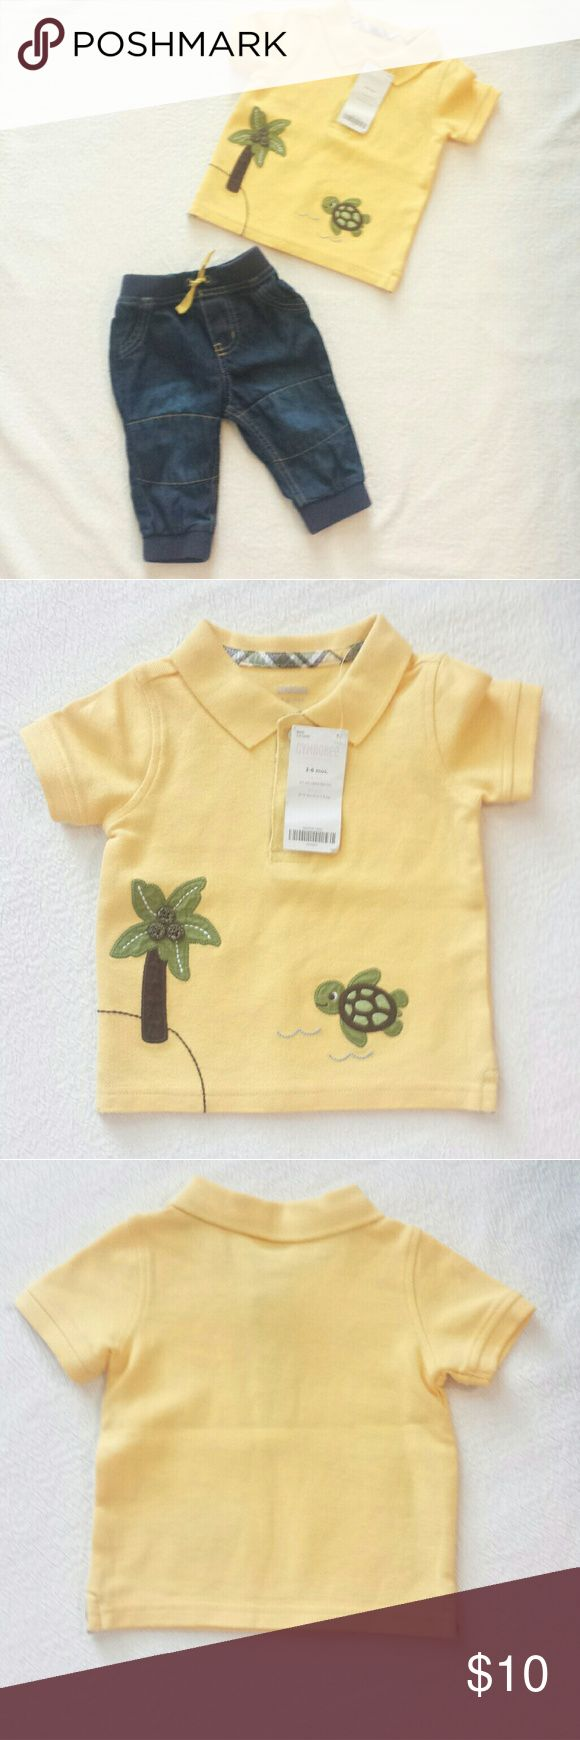 🔴NWT Gymboree Yellow Sea Escape Polo NWT 3-6 month Gymboree Yellow Sea Escape Polo. Cute little sea turtle and an Island w/ a palm tree. Gymboree Shirts & Tops Polos